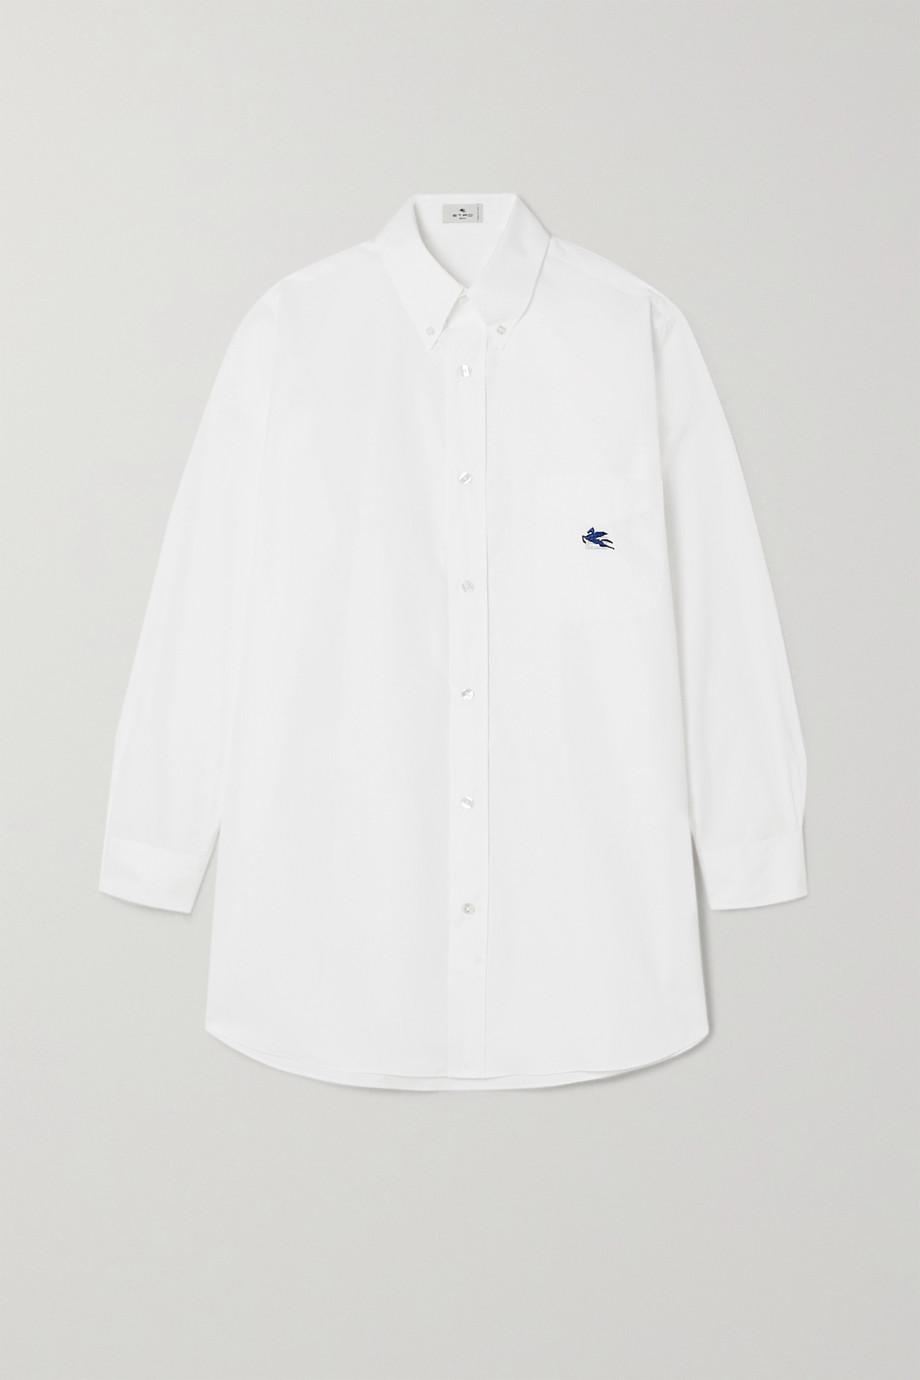 Etro Cotton-poplin shirt